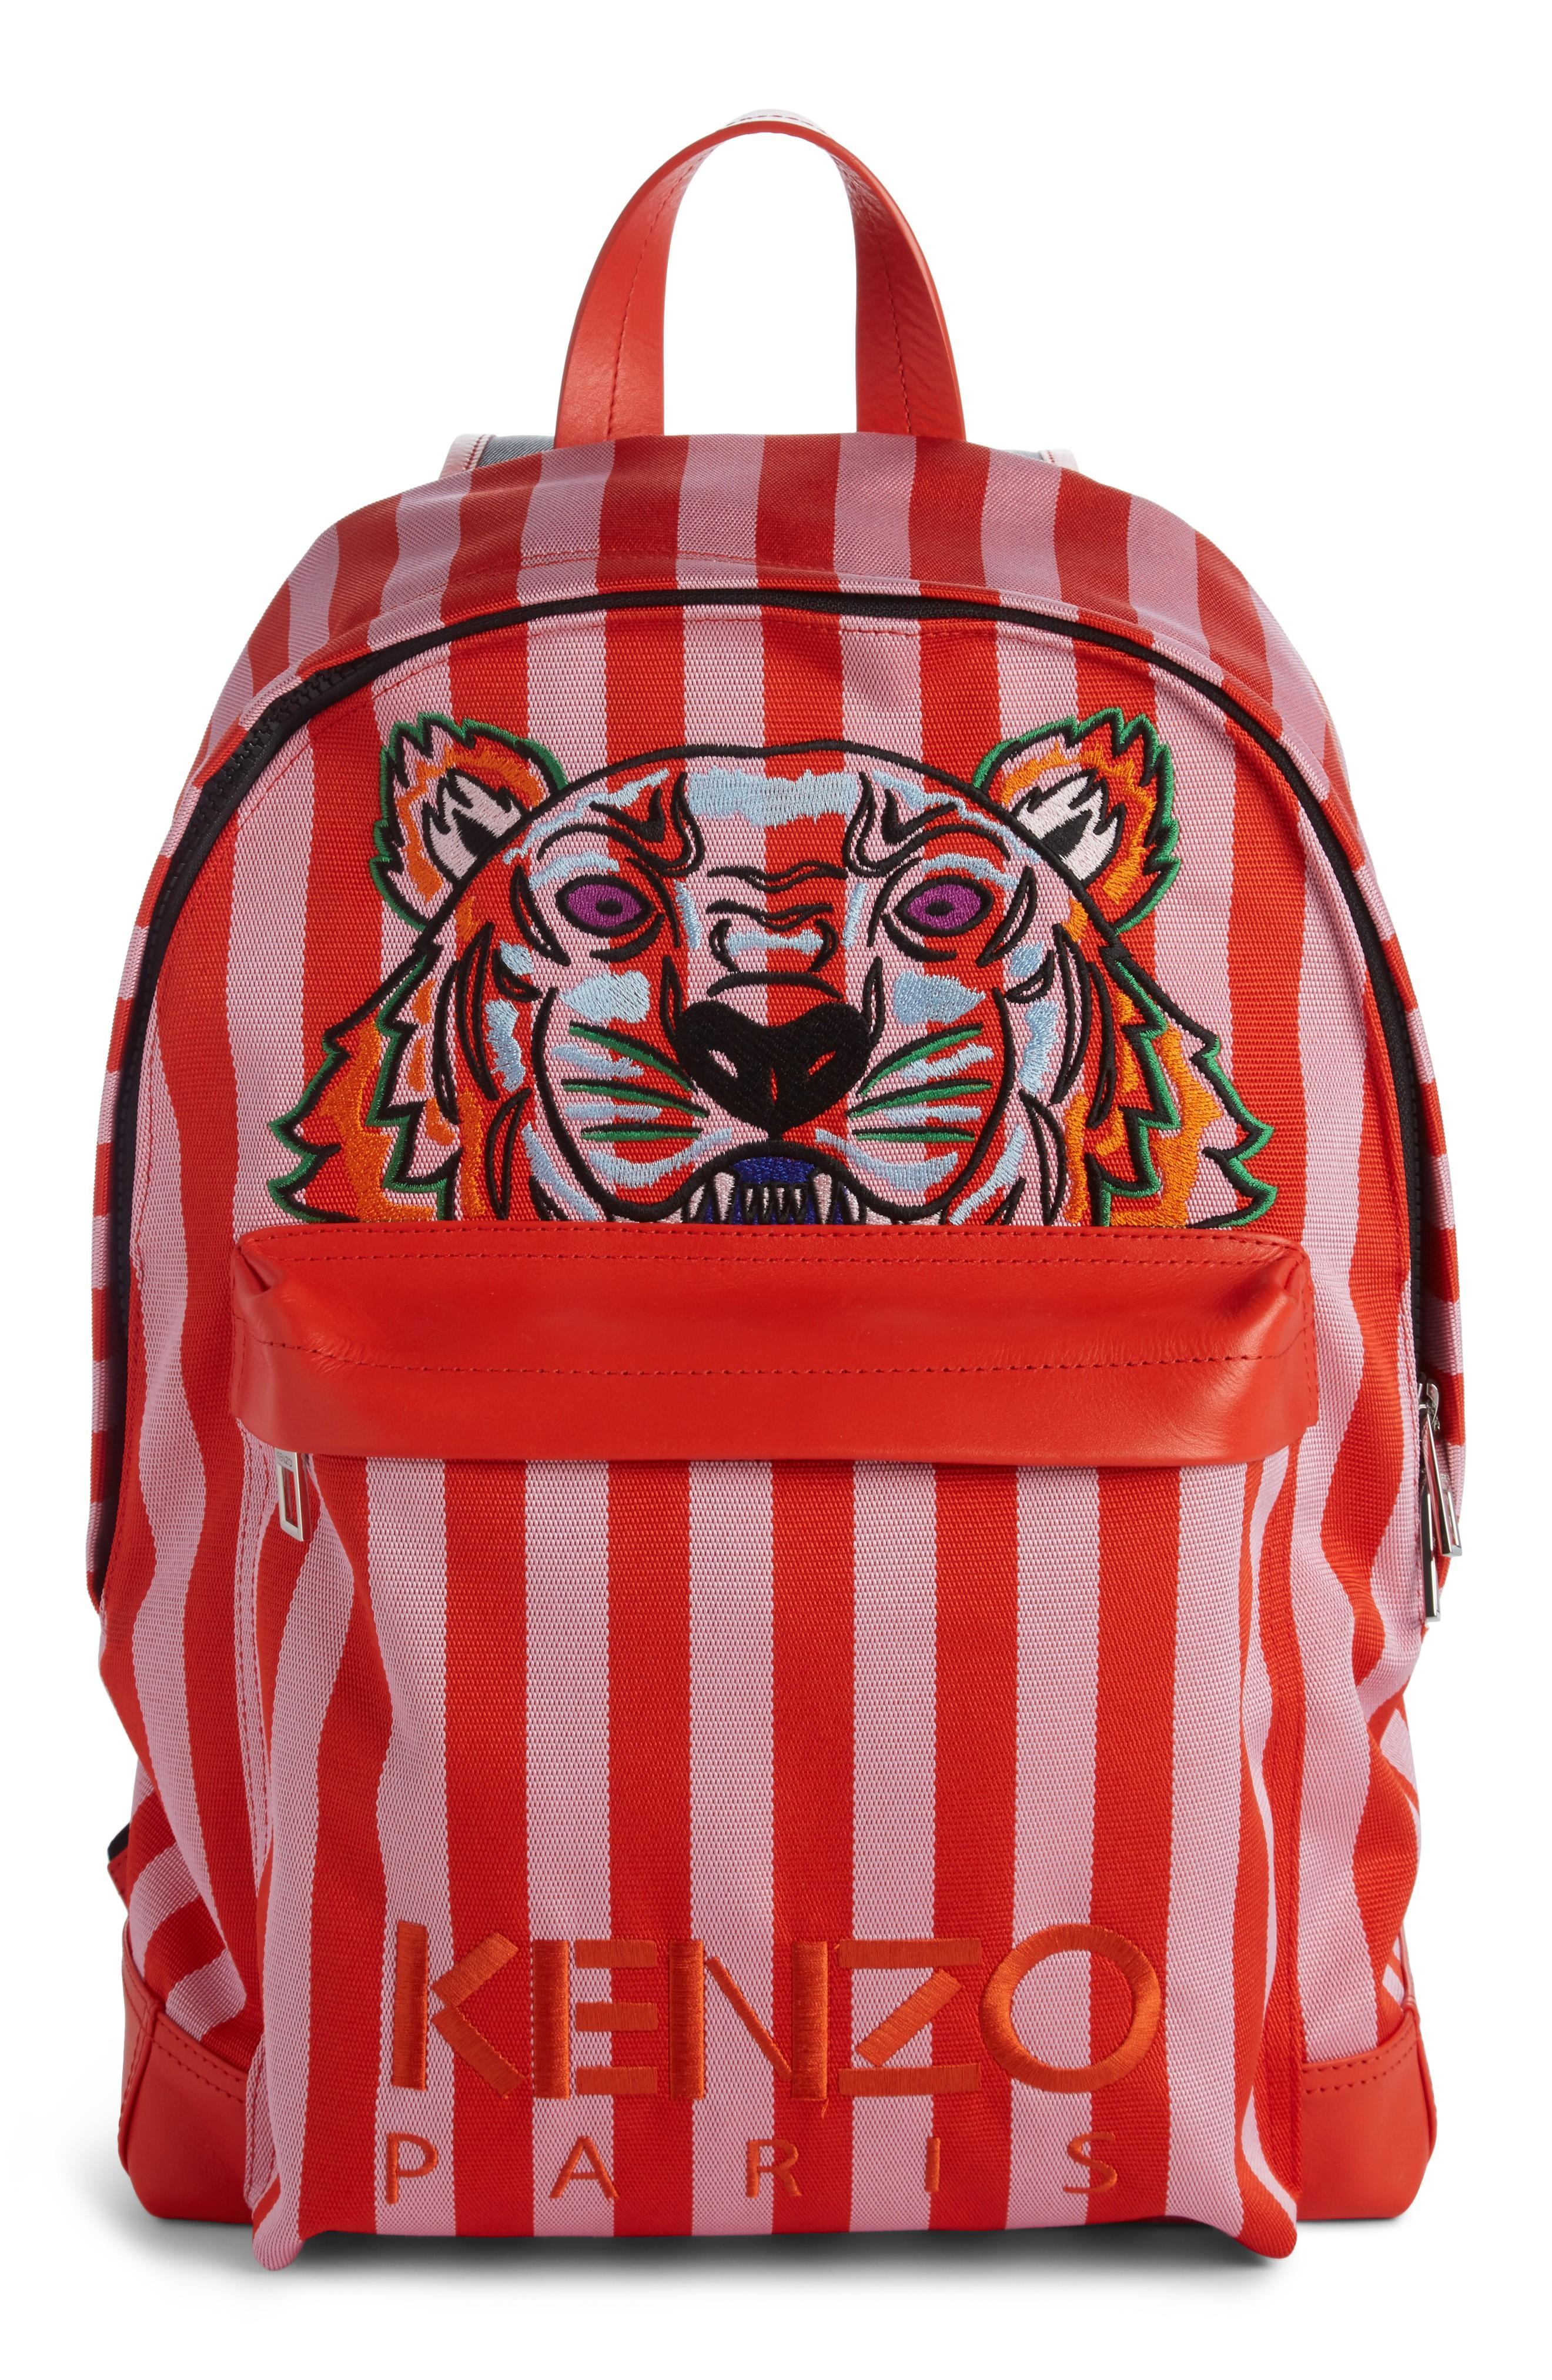 Kenzo Kanvas Embroidered Tiger Stripe Backpack - Pink In Flamingo Pink